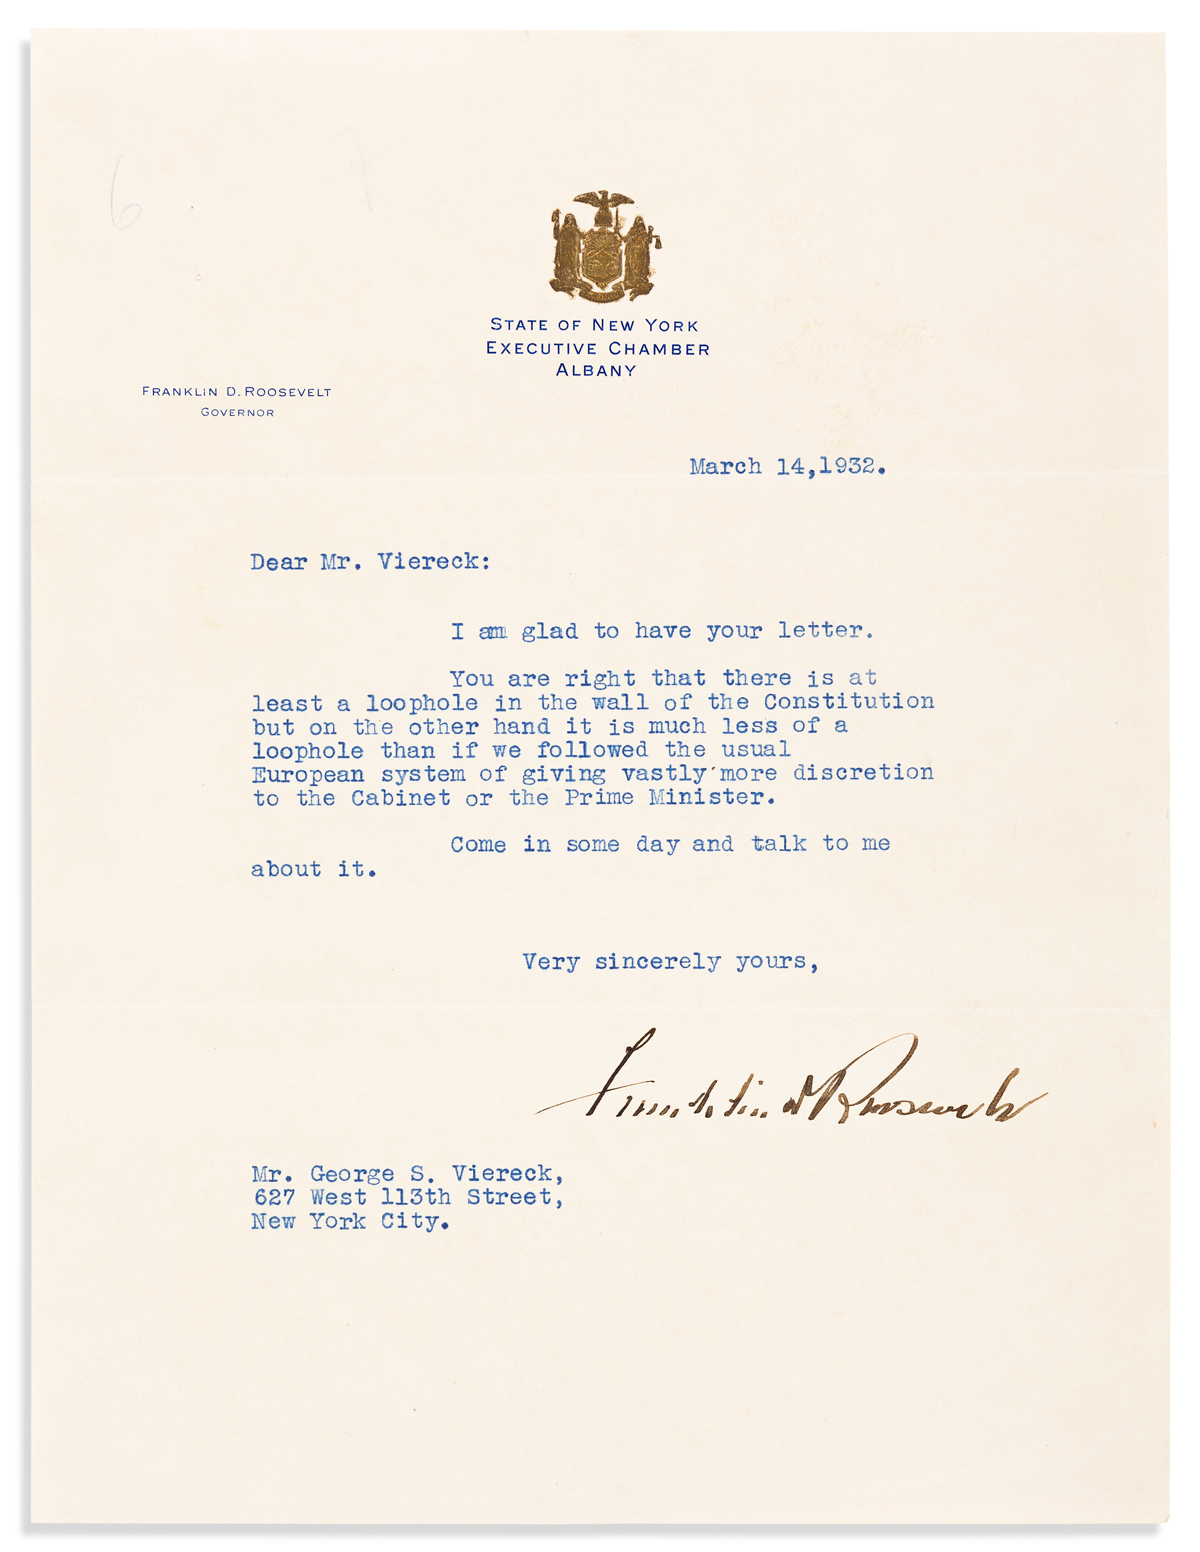 ROOSEVELT, FRANKLIN D. Typed Letter Signed, as Governor, to German-American poet and advocate of National Socialism George Sylvester Vi